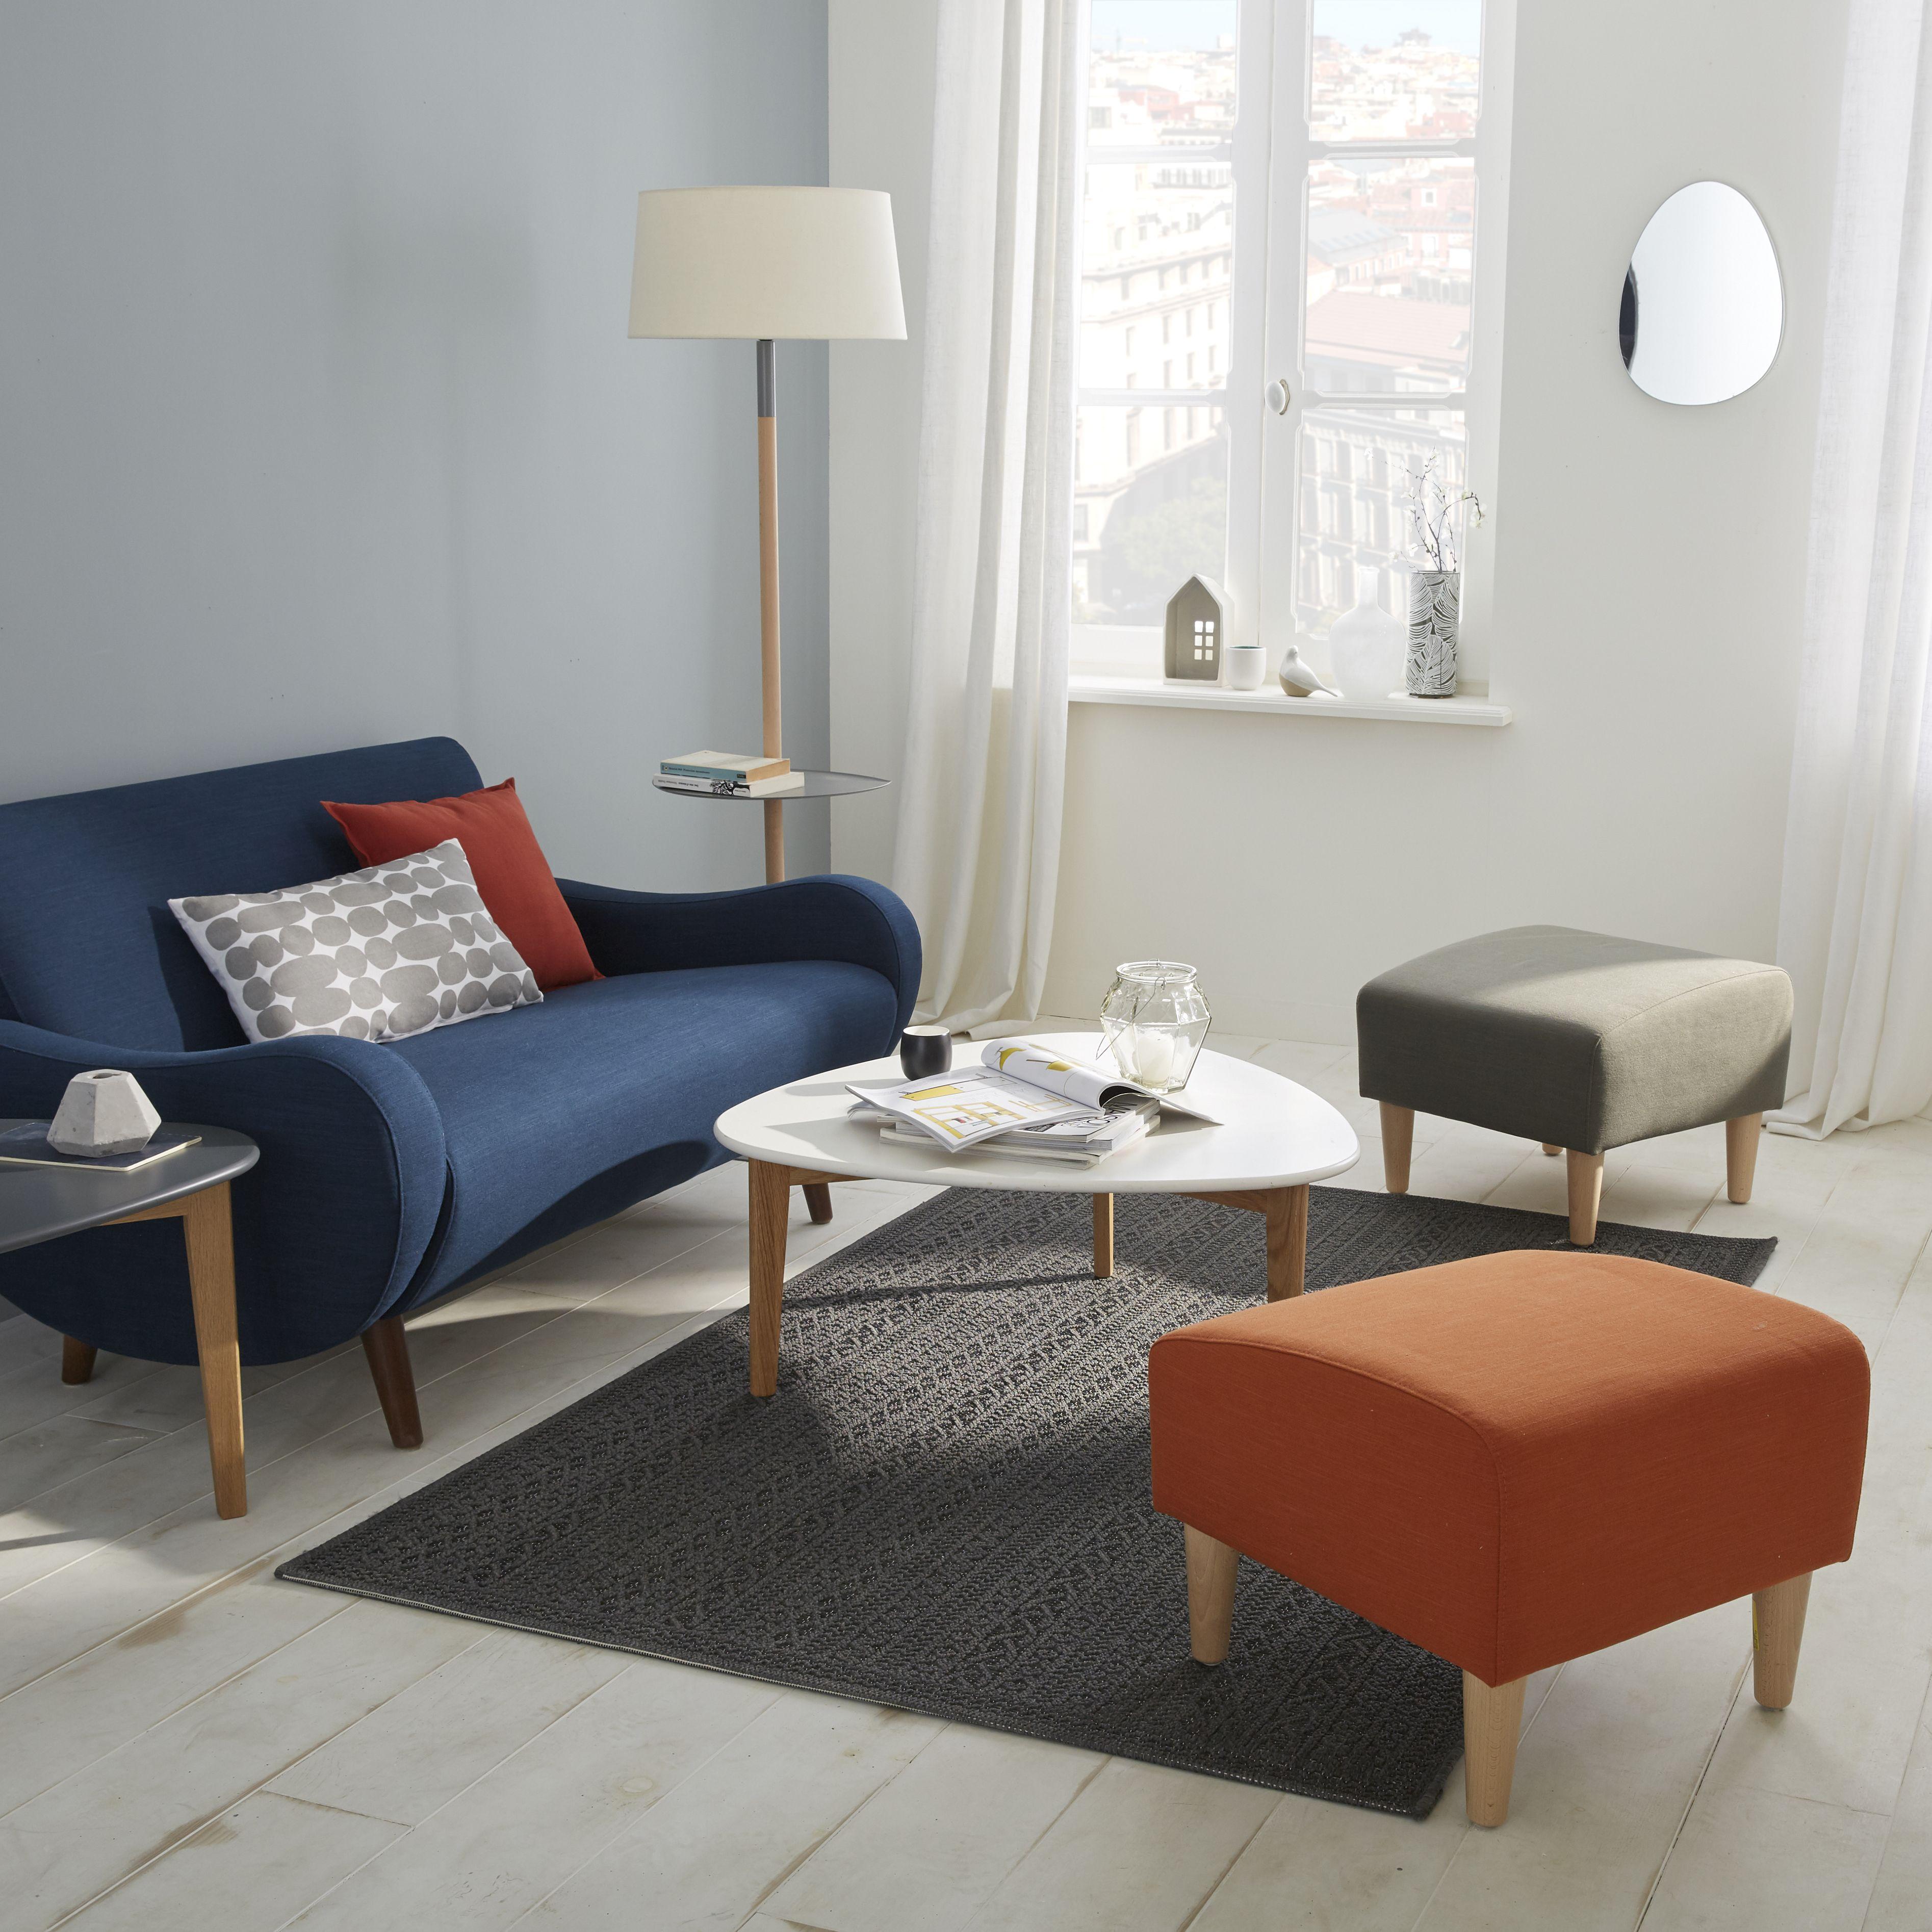 Fauteuil Lit Convertible Alinea canapé poppy | 30luxe meuble salon scandinave anciendemutu org